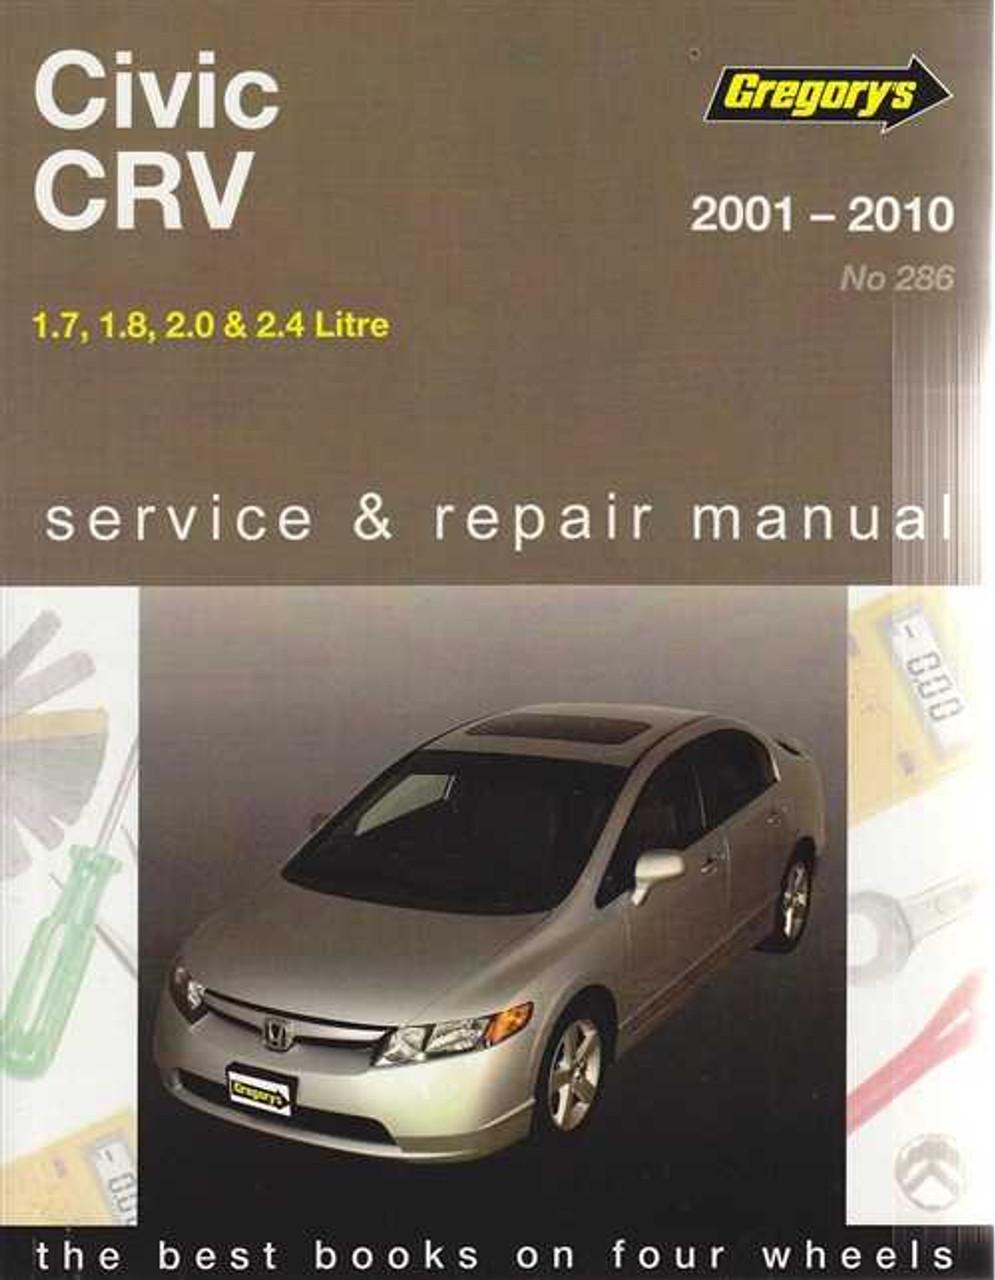 honda civic crv 1 7 1 8 2 0 2 4 litre 2001 2010 workshop manual rh automotobookshop com au 2000 honda crv service manual pdf 2001 honda crv workshop manual pdf